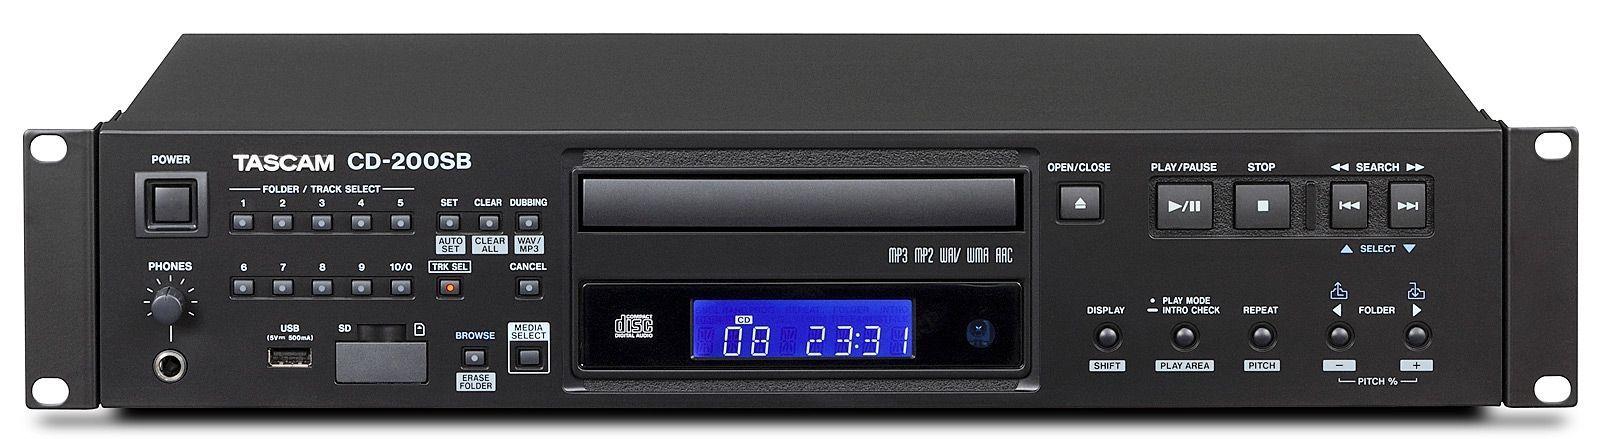 Tascam CD-200 SB Solid-State-/CD-Player mit USB + SD Slot inkl. IR-Fernbedienung